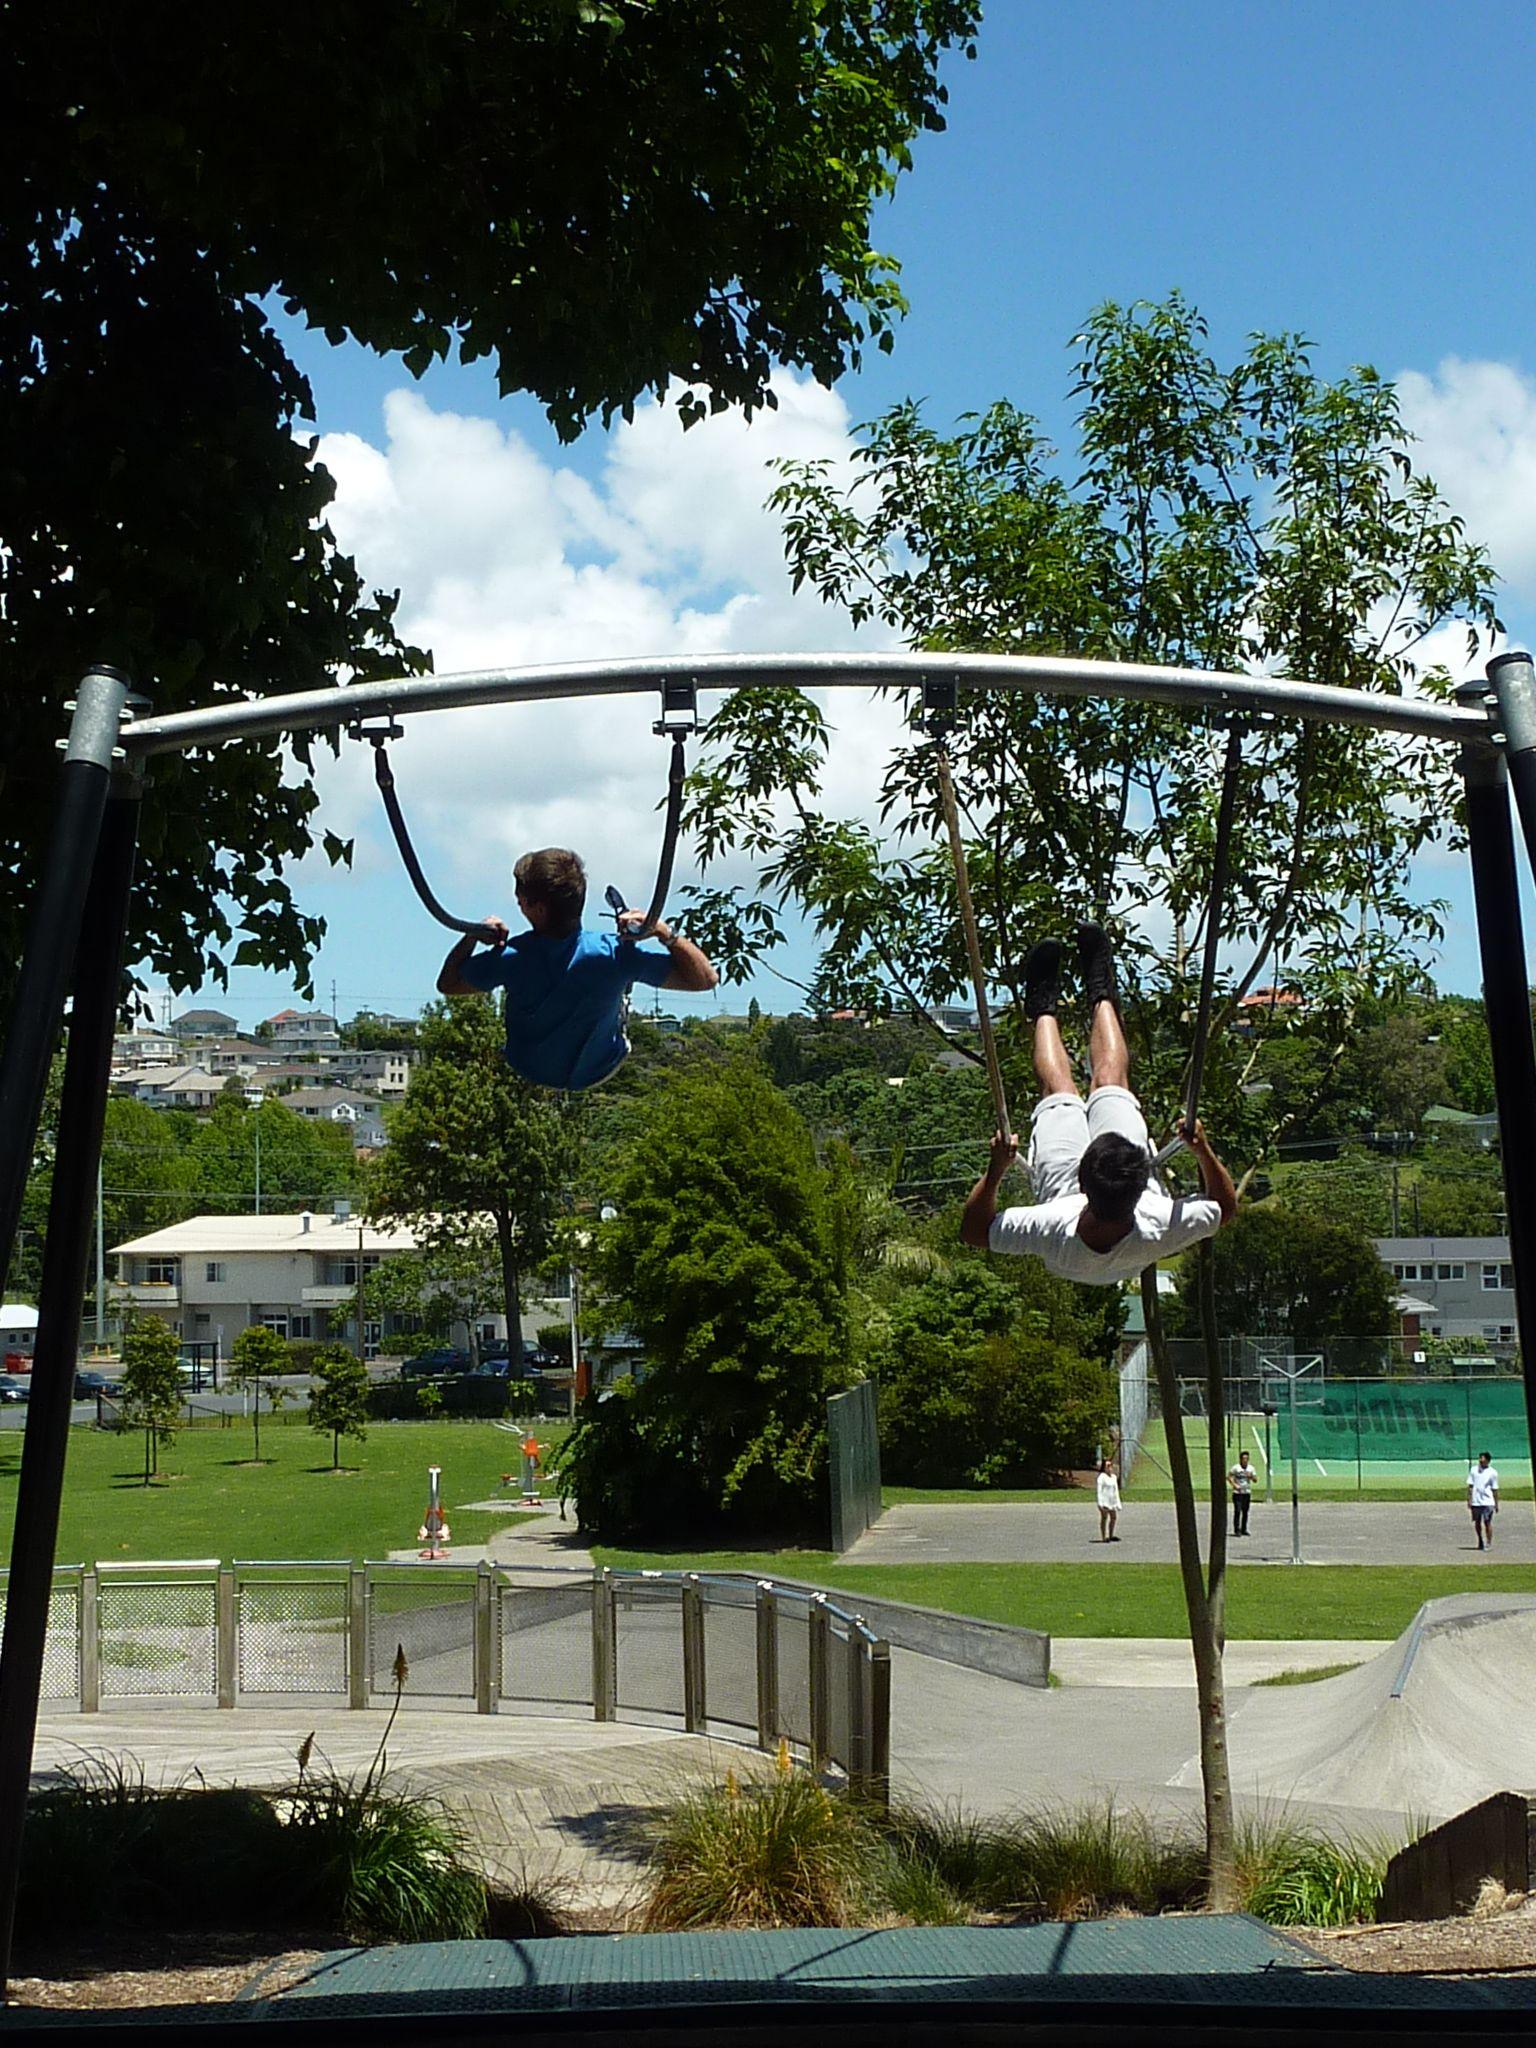 Marlborough Reserve big swings